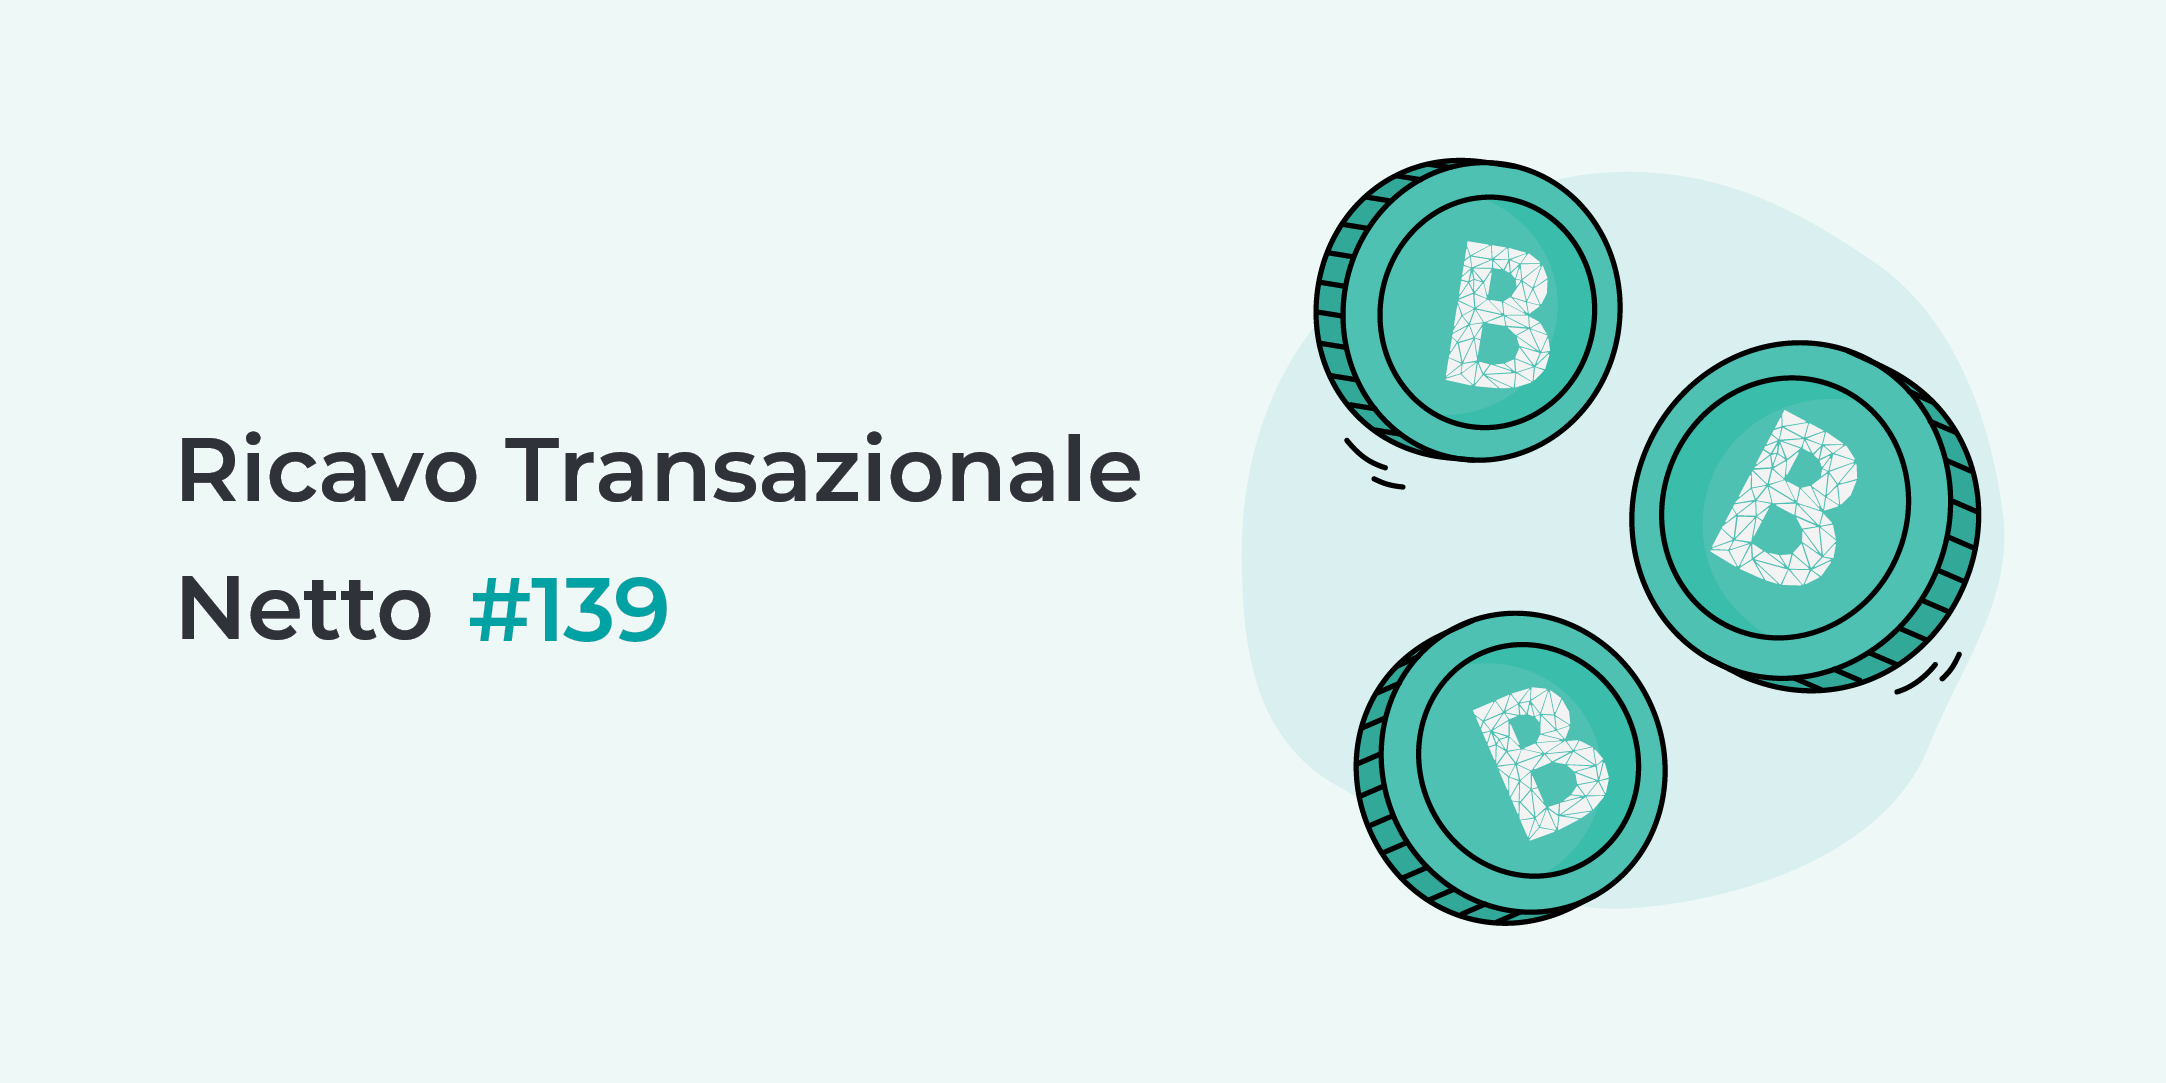 Net Transactional Revenue Number 139